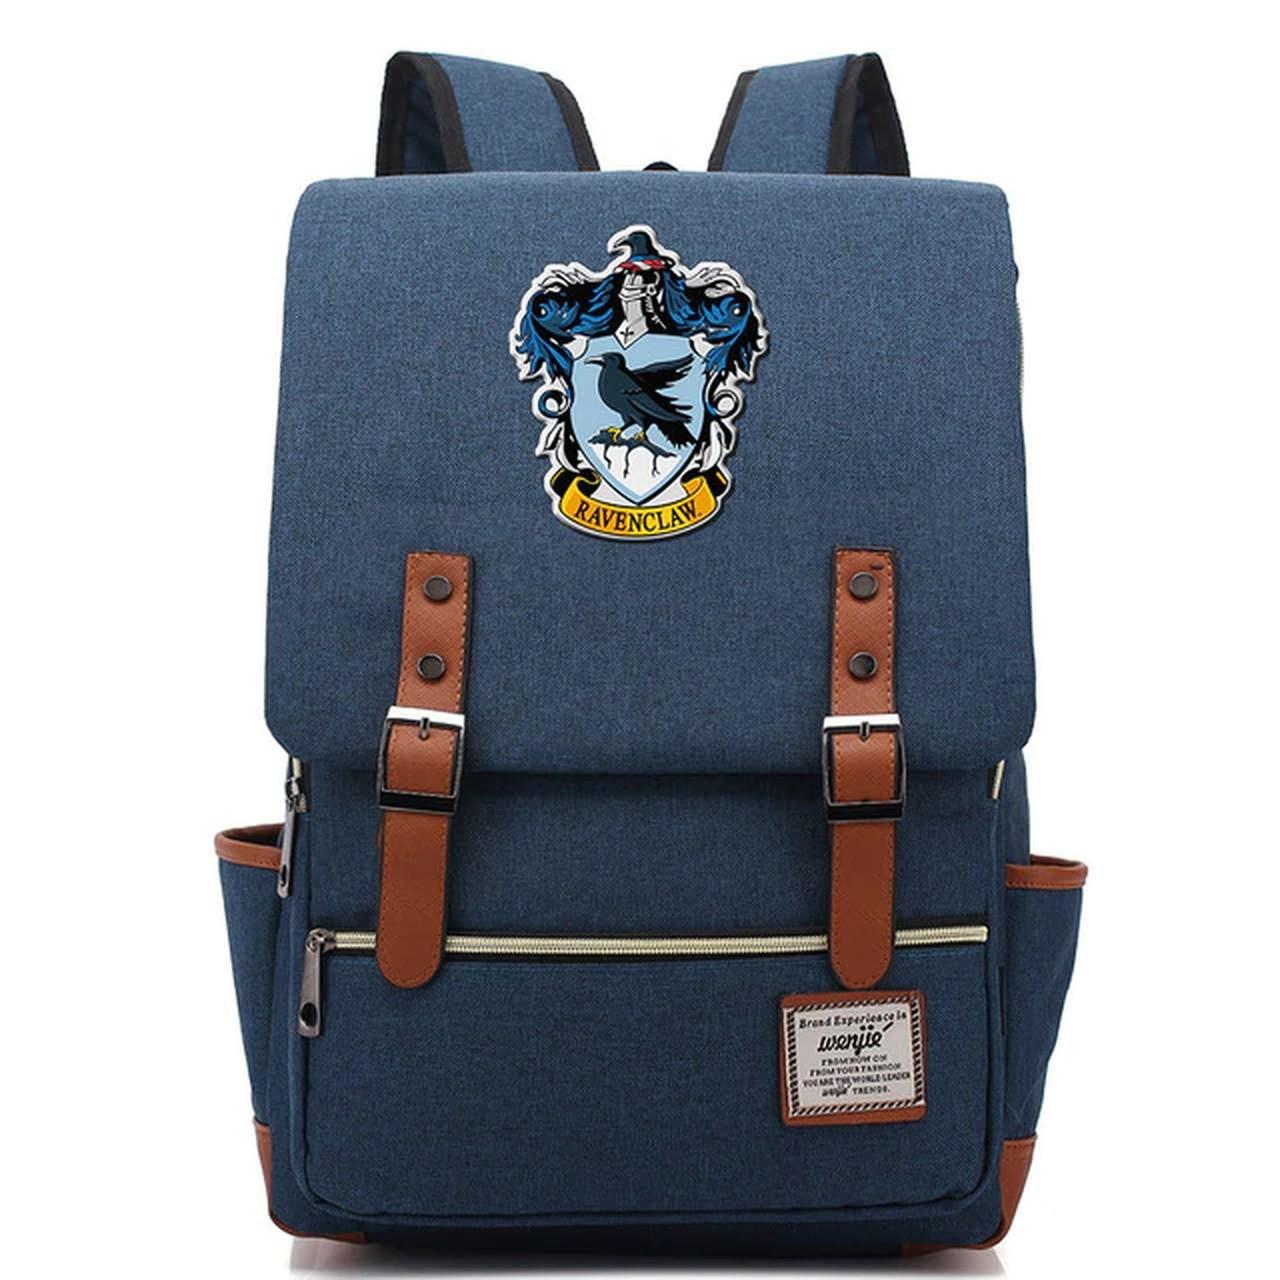 Mochila Hogwarts Casa Corvinal: Harry Potter (Azul Marinho)